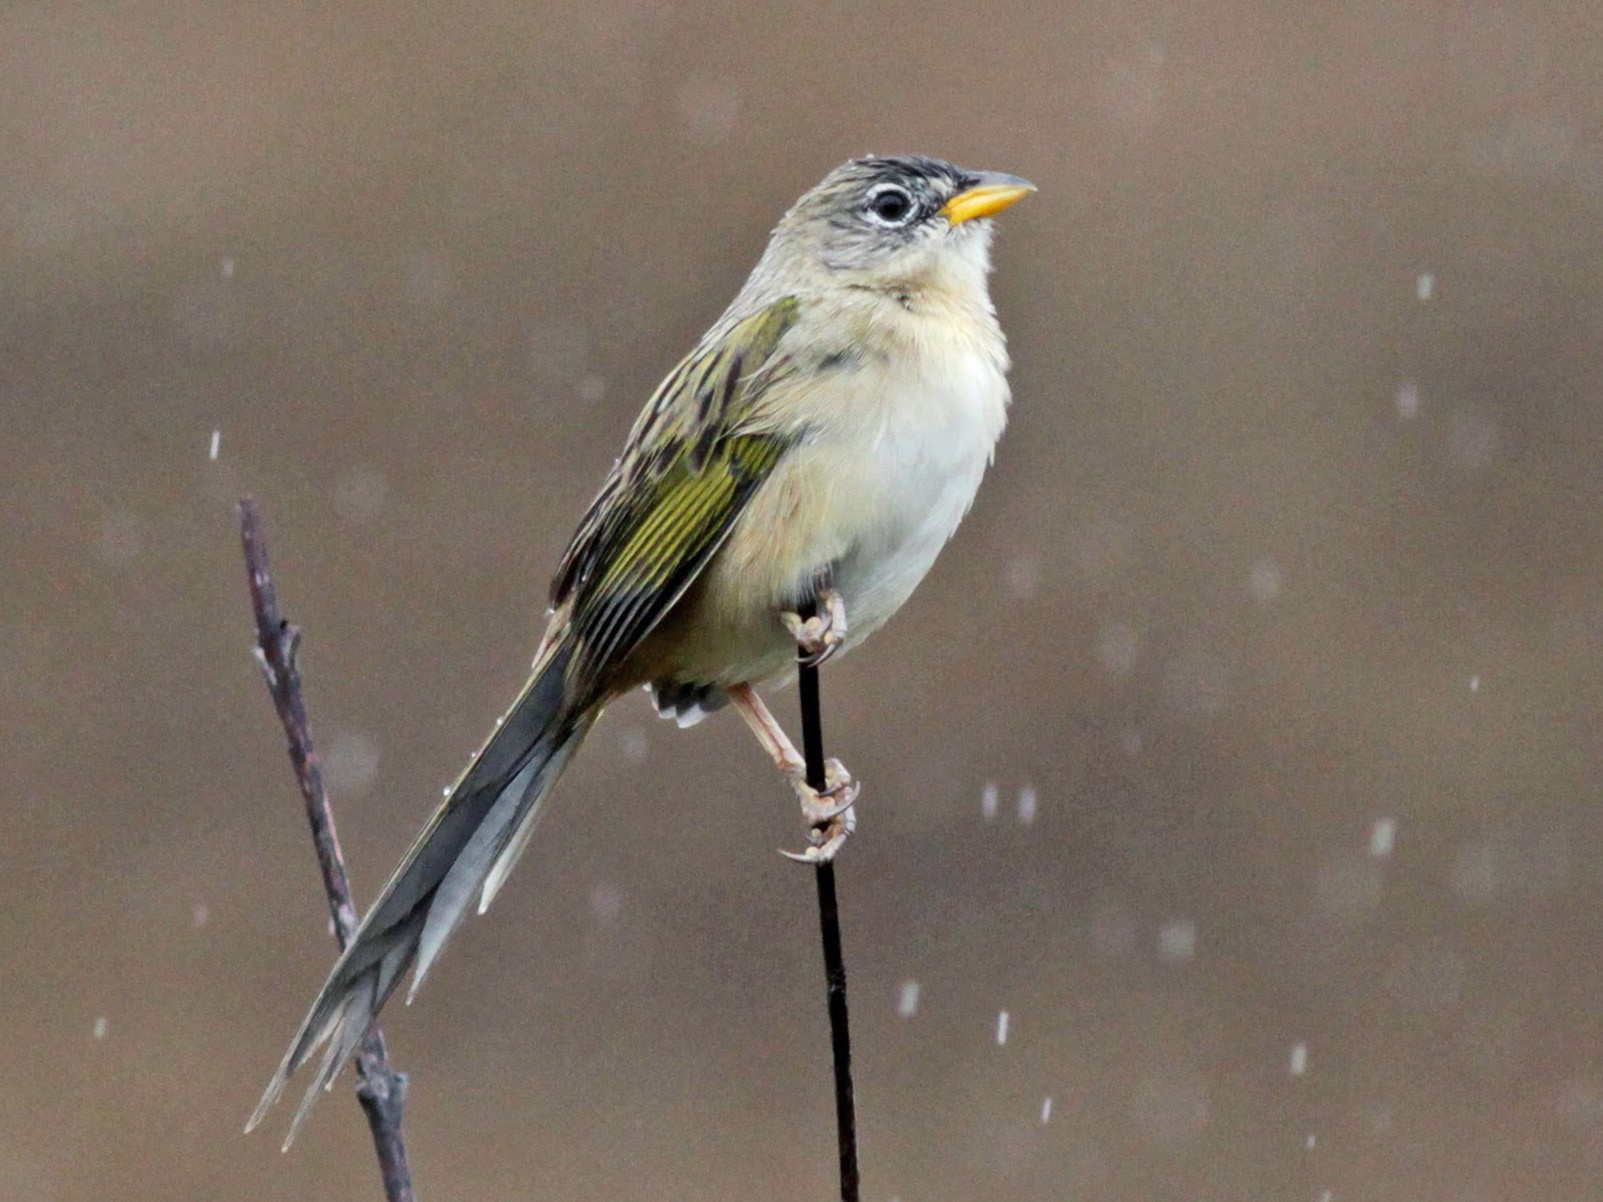 Wedge-tailed Grass-Finch - Jay McGowan